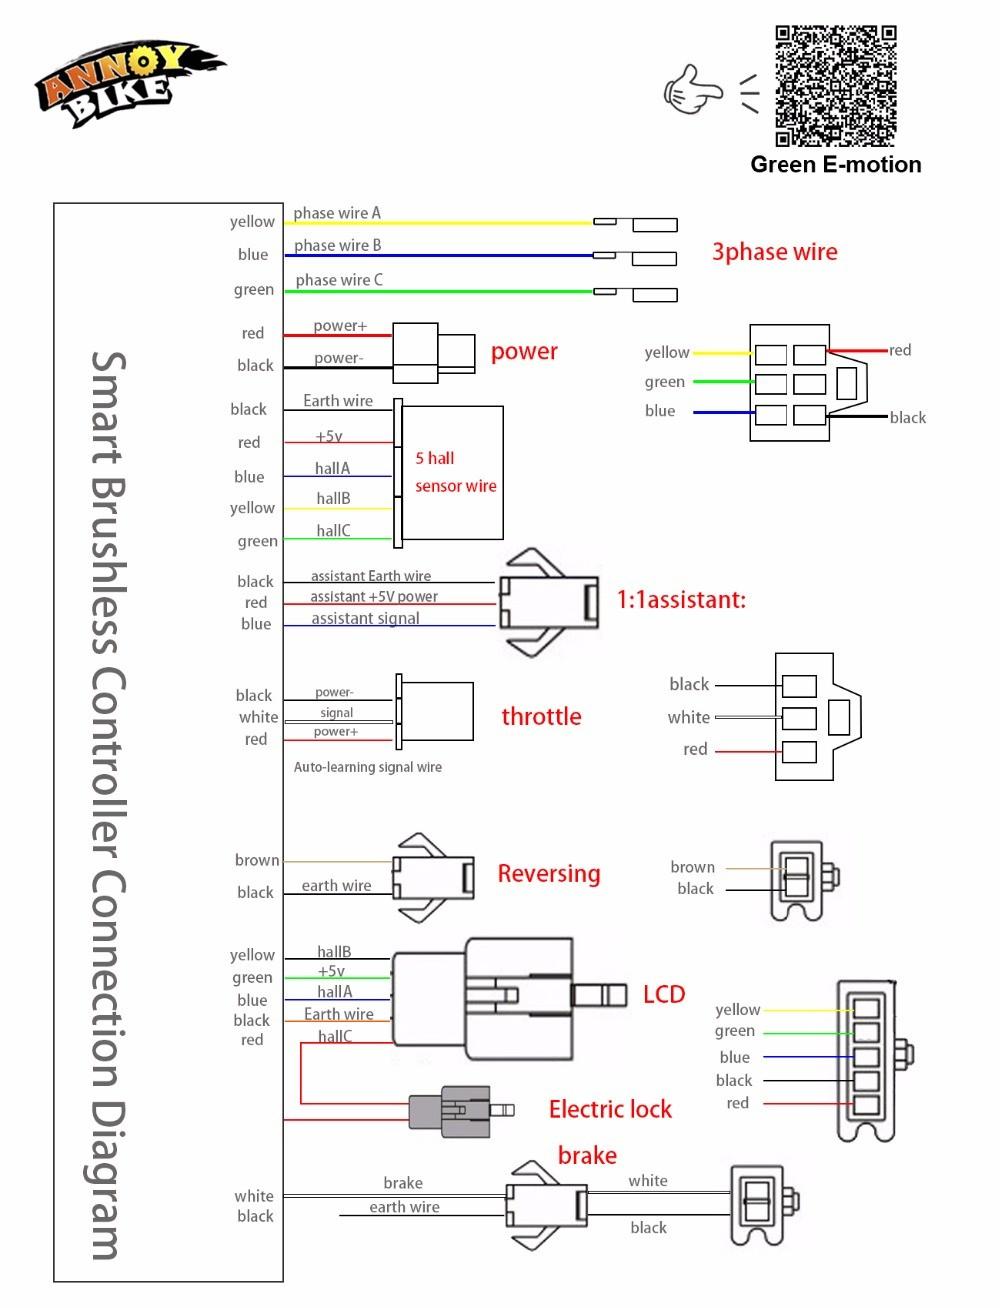 E Bike Wiring Diagrams | Manual E-Books - E Bike Controller Wiring Diagram